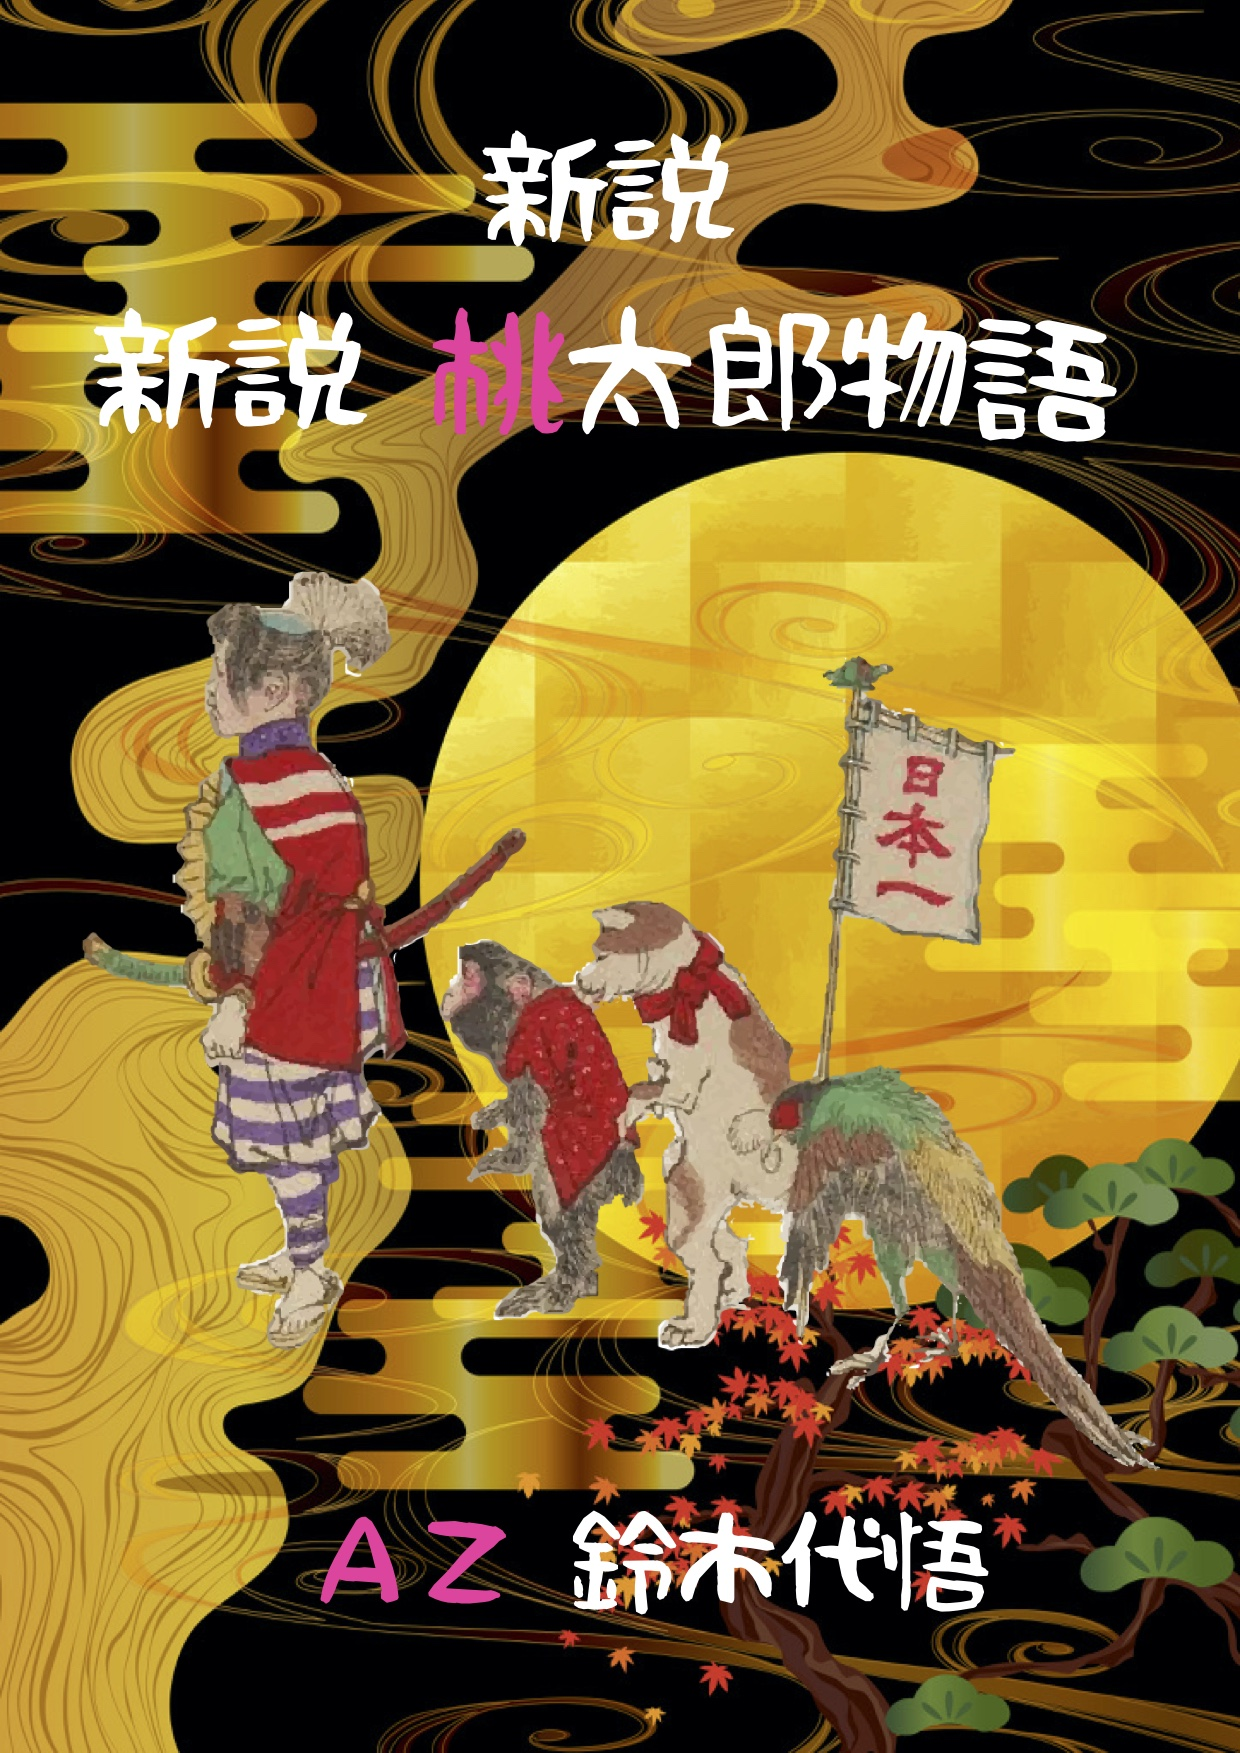 新説桃太郎物語 ベイス 宣伝用8